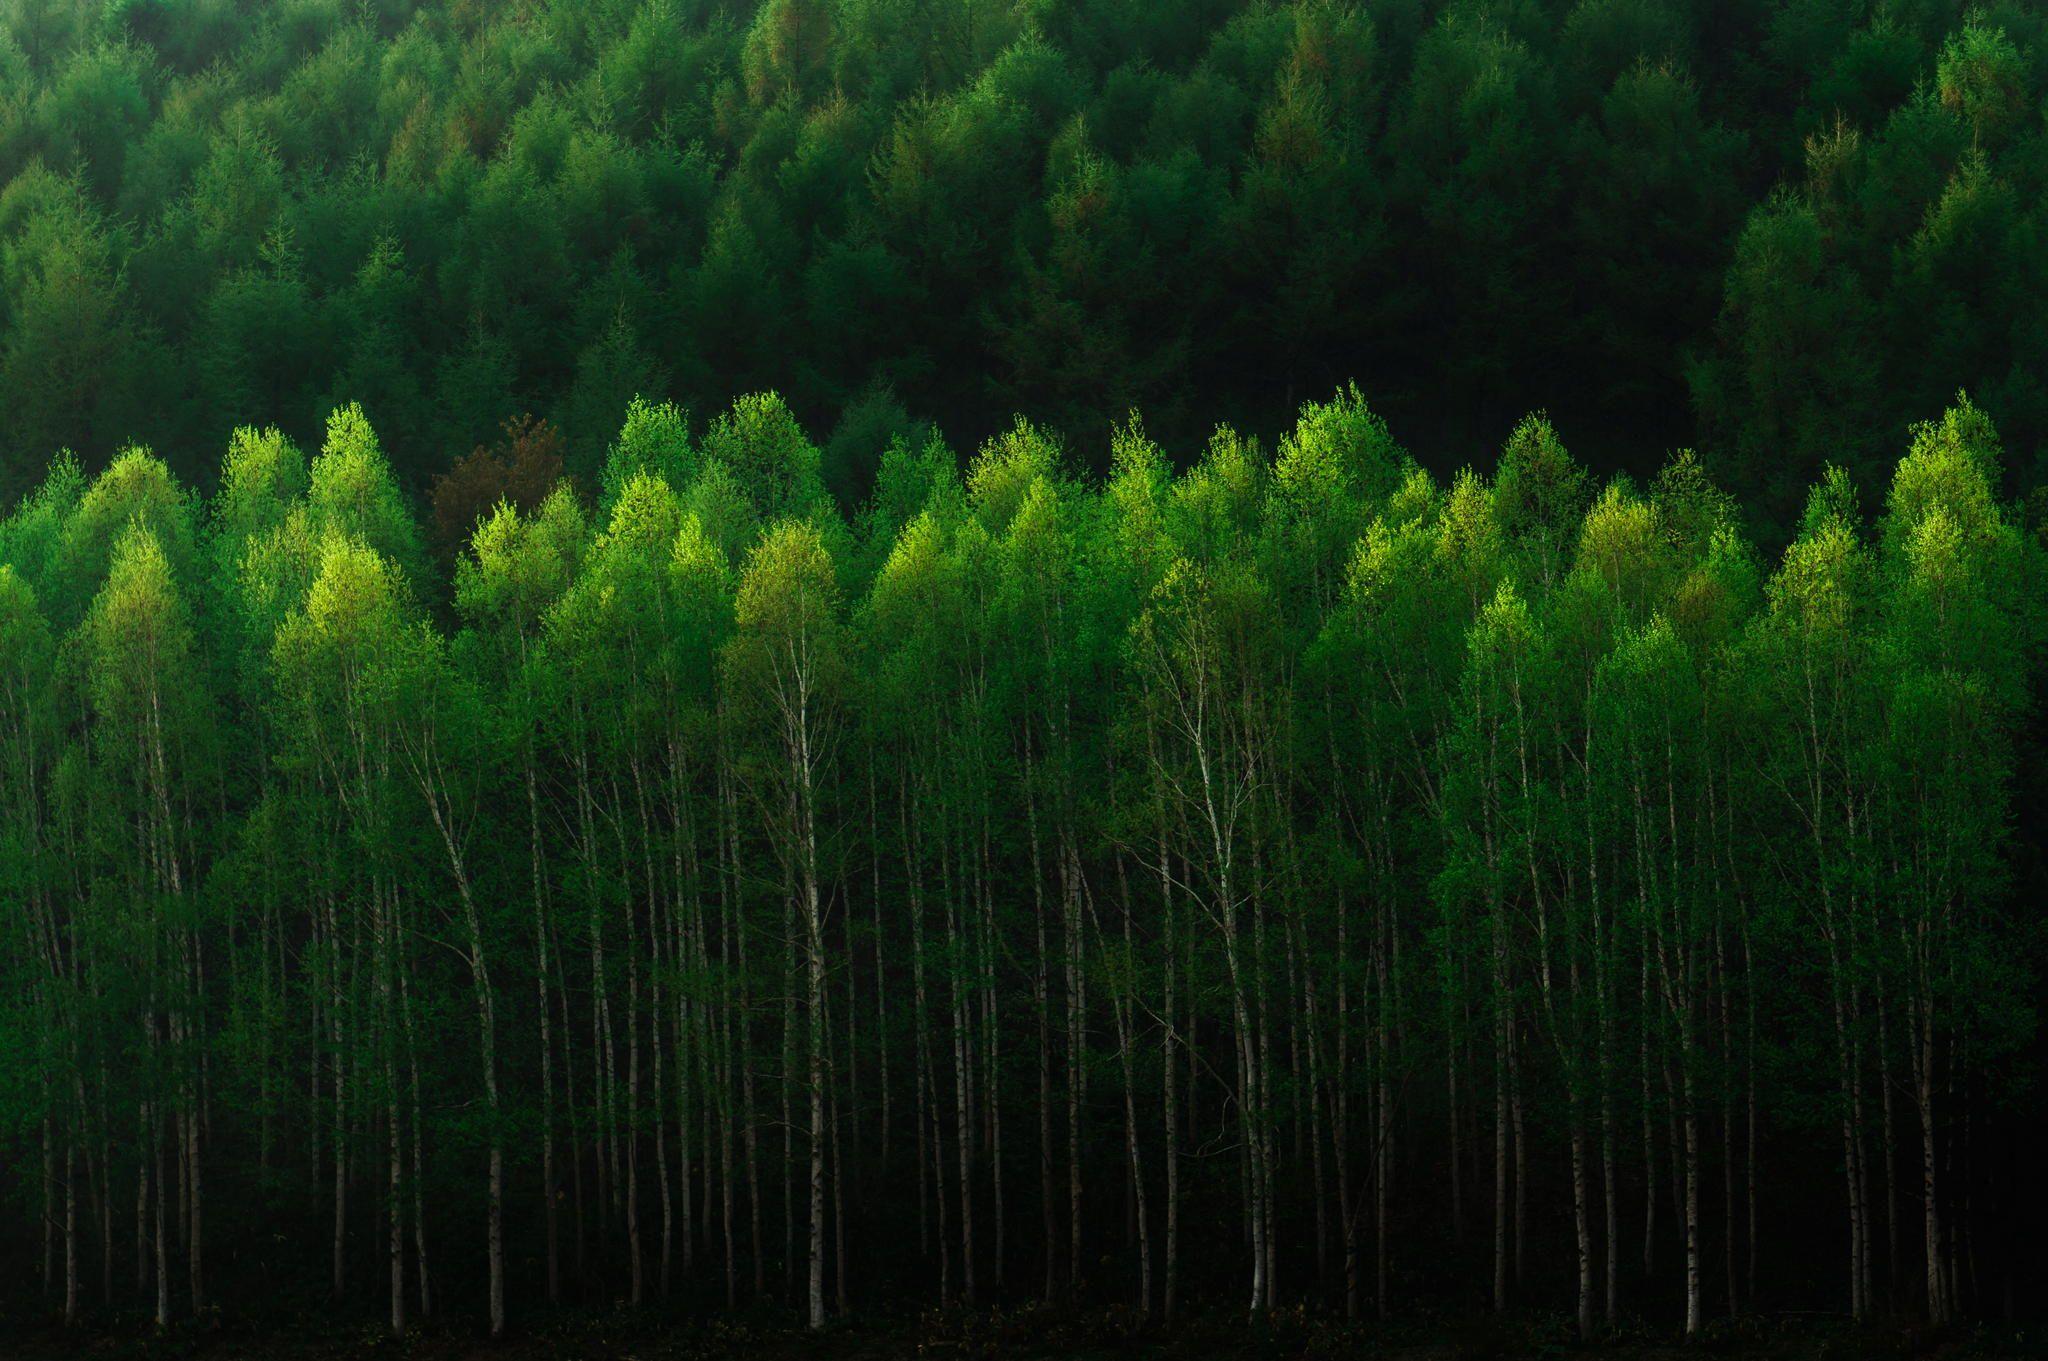 White birch trees with fresh green, Hokkaido Japan.